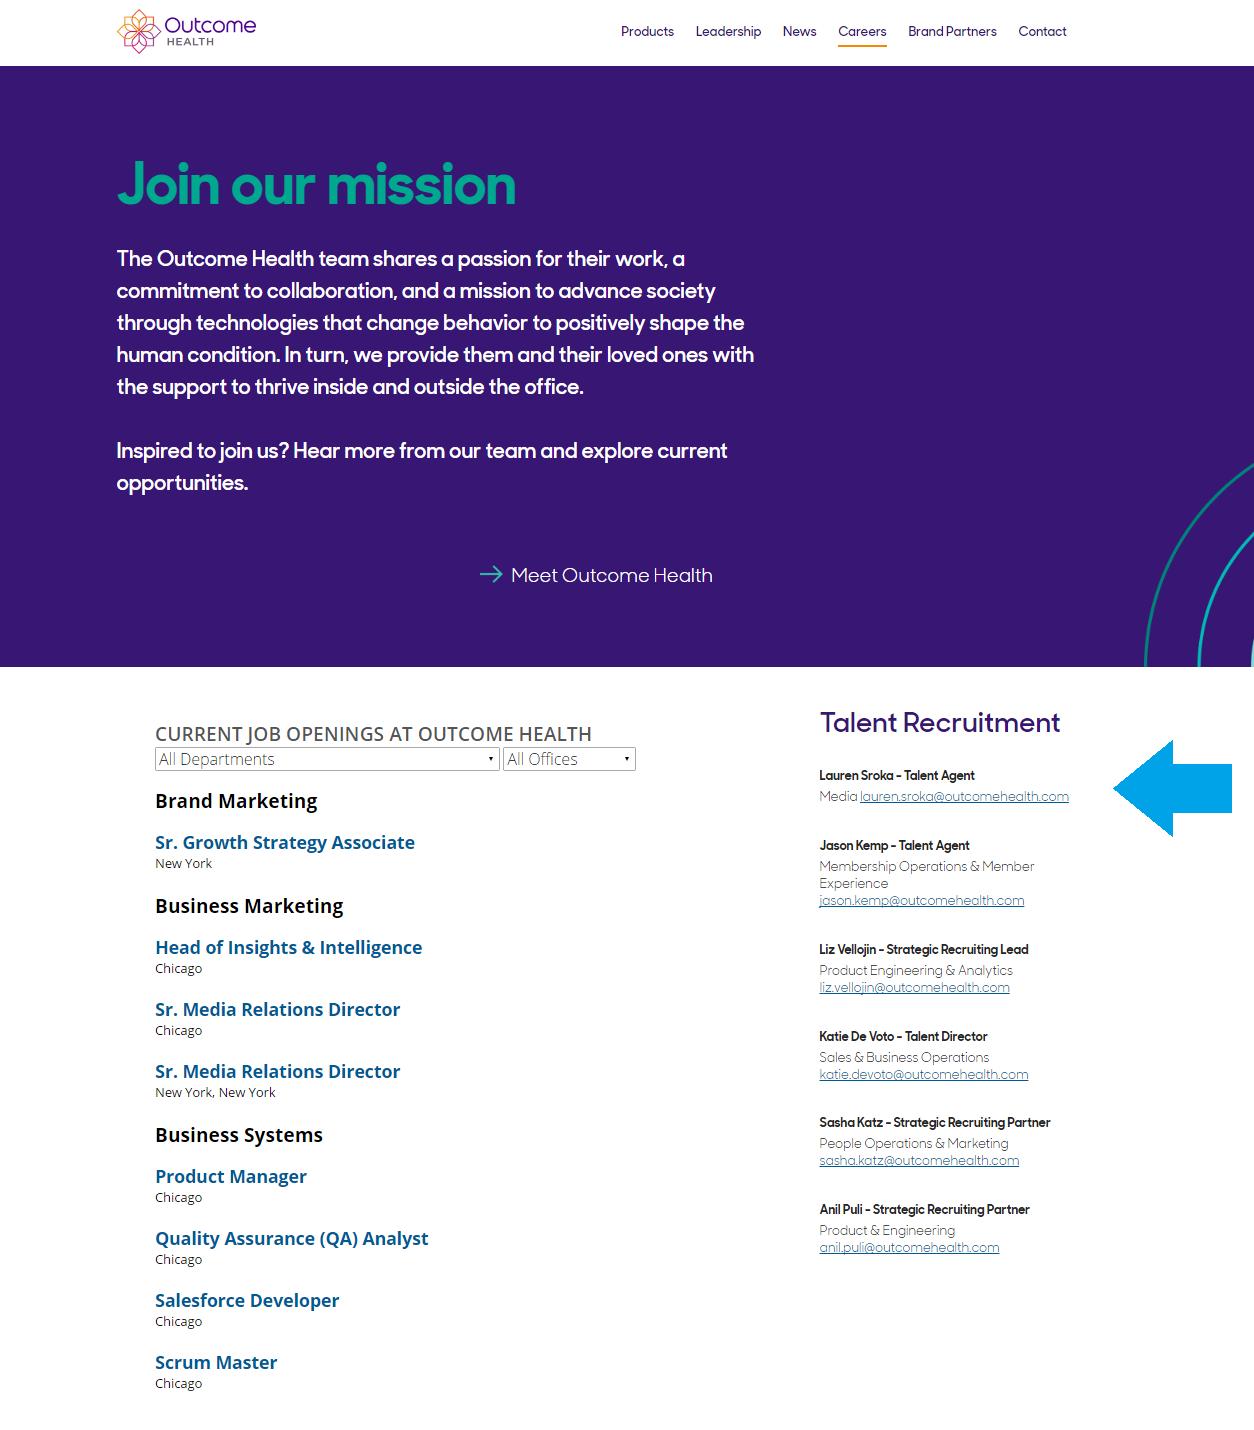 Outcome Health Company Career Site